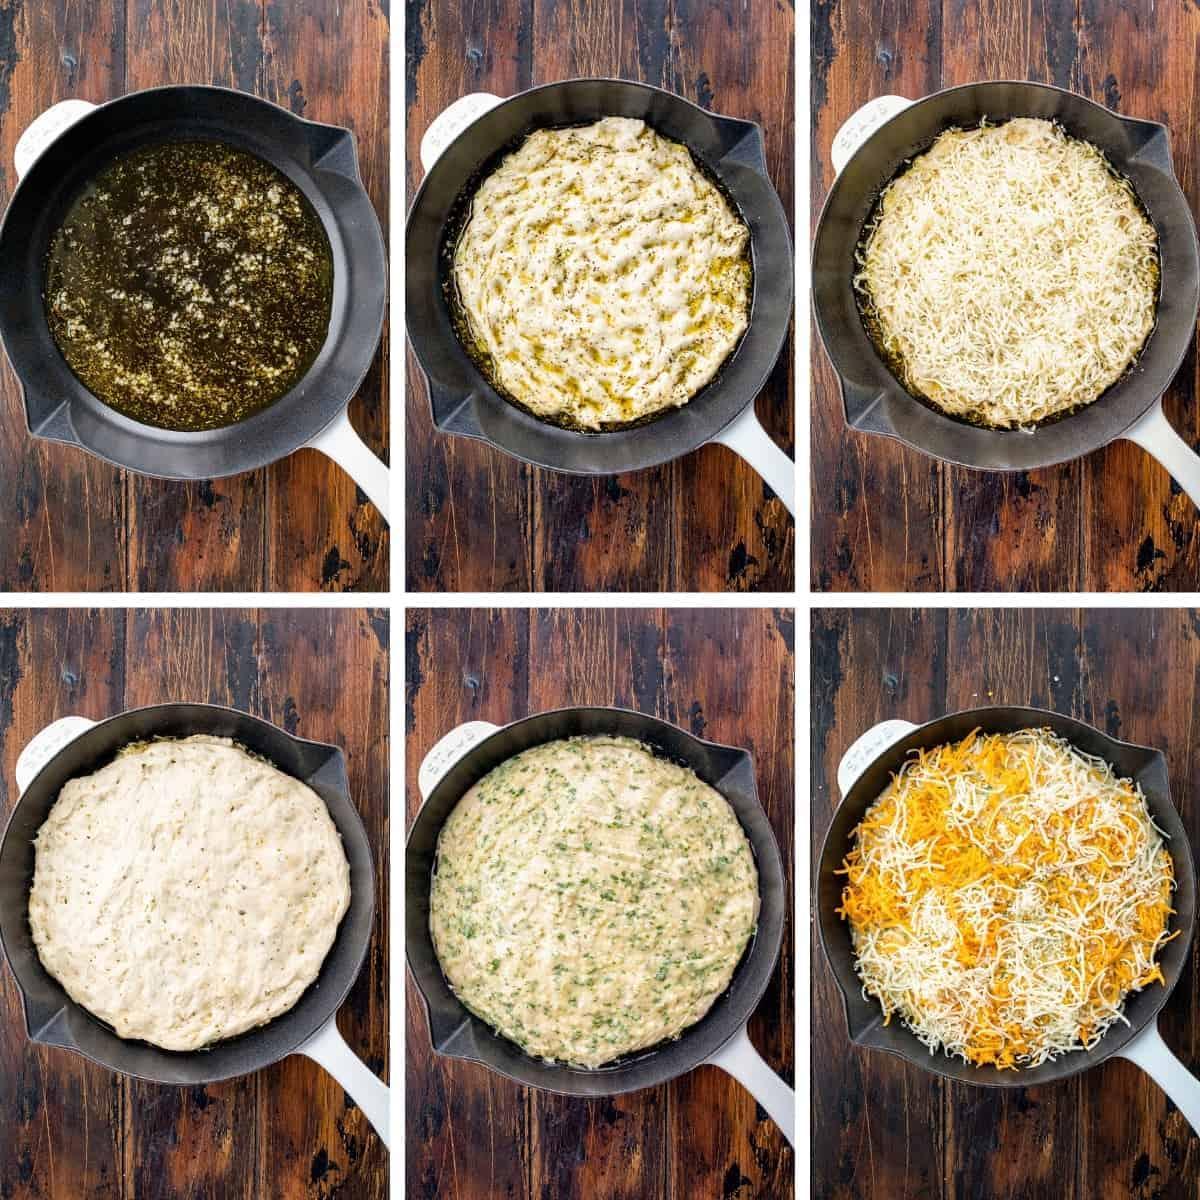 Steps for Layering Focaccia Cheesy Garlic Bread